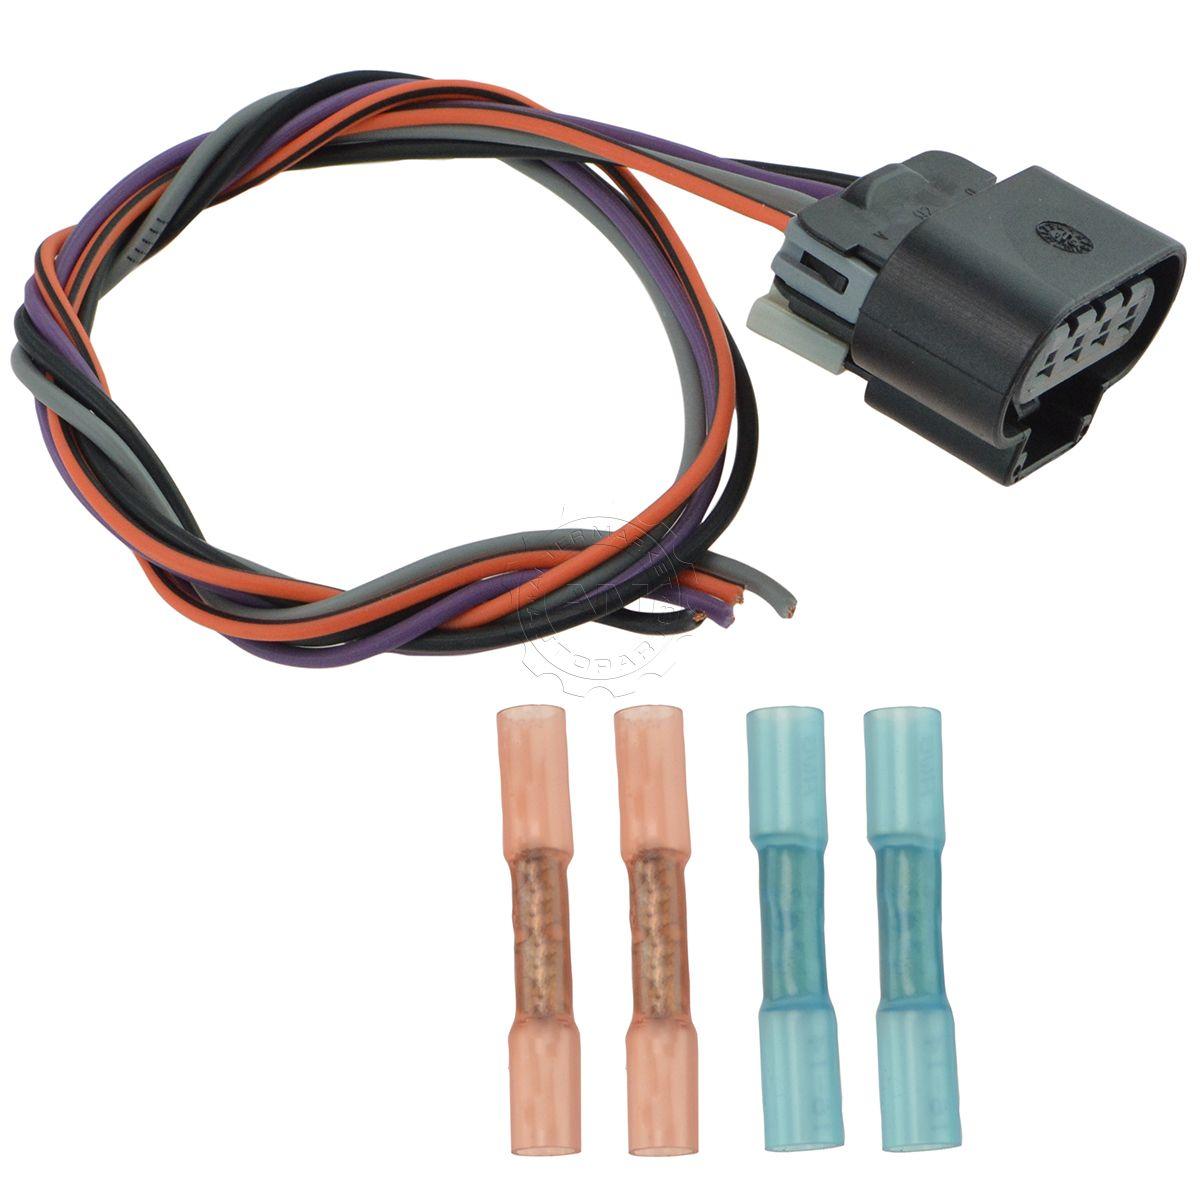 delphi fa10003 fuel pump wiring harness connector oval plug for rh ebay com Fuel Pump Wiring Harness Fuel Pump Relay Wiring